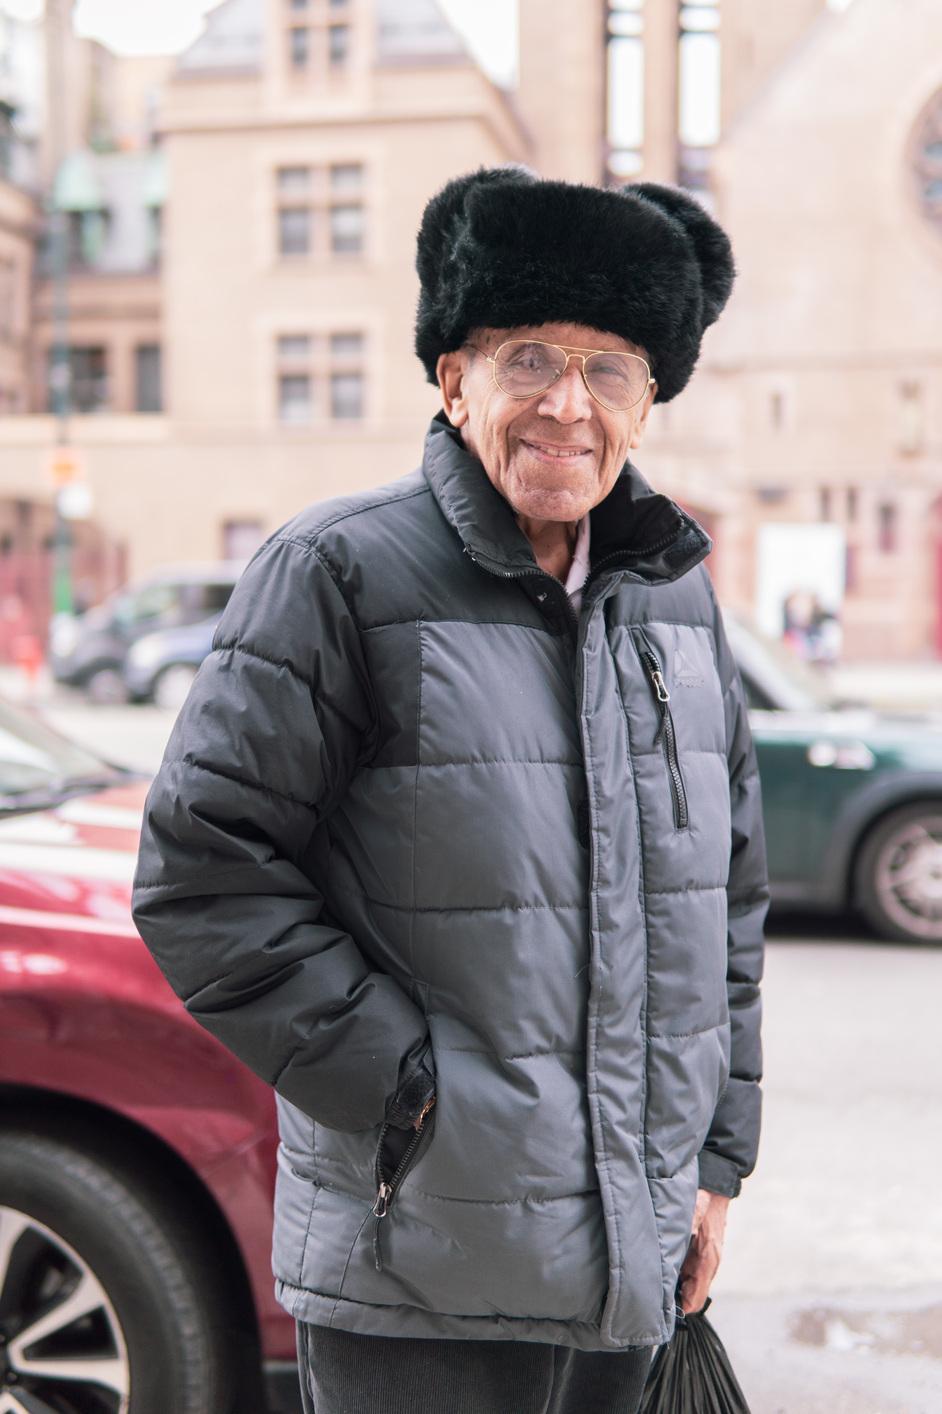 kind smiling man, NYC